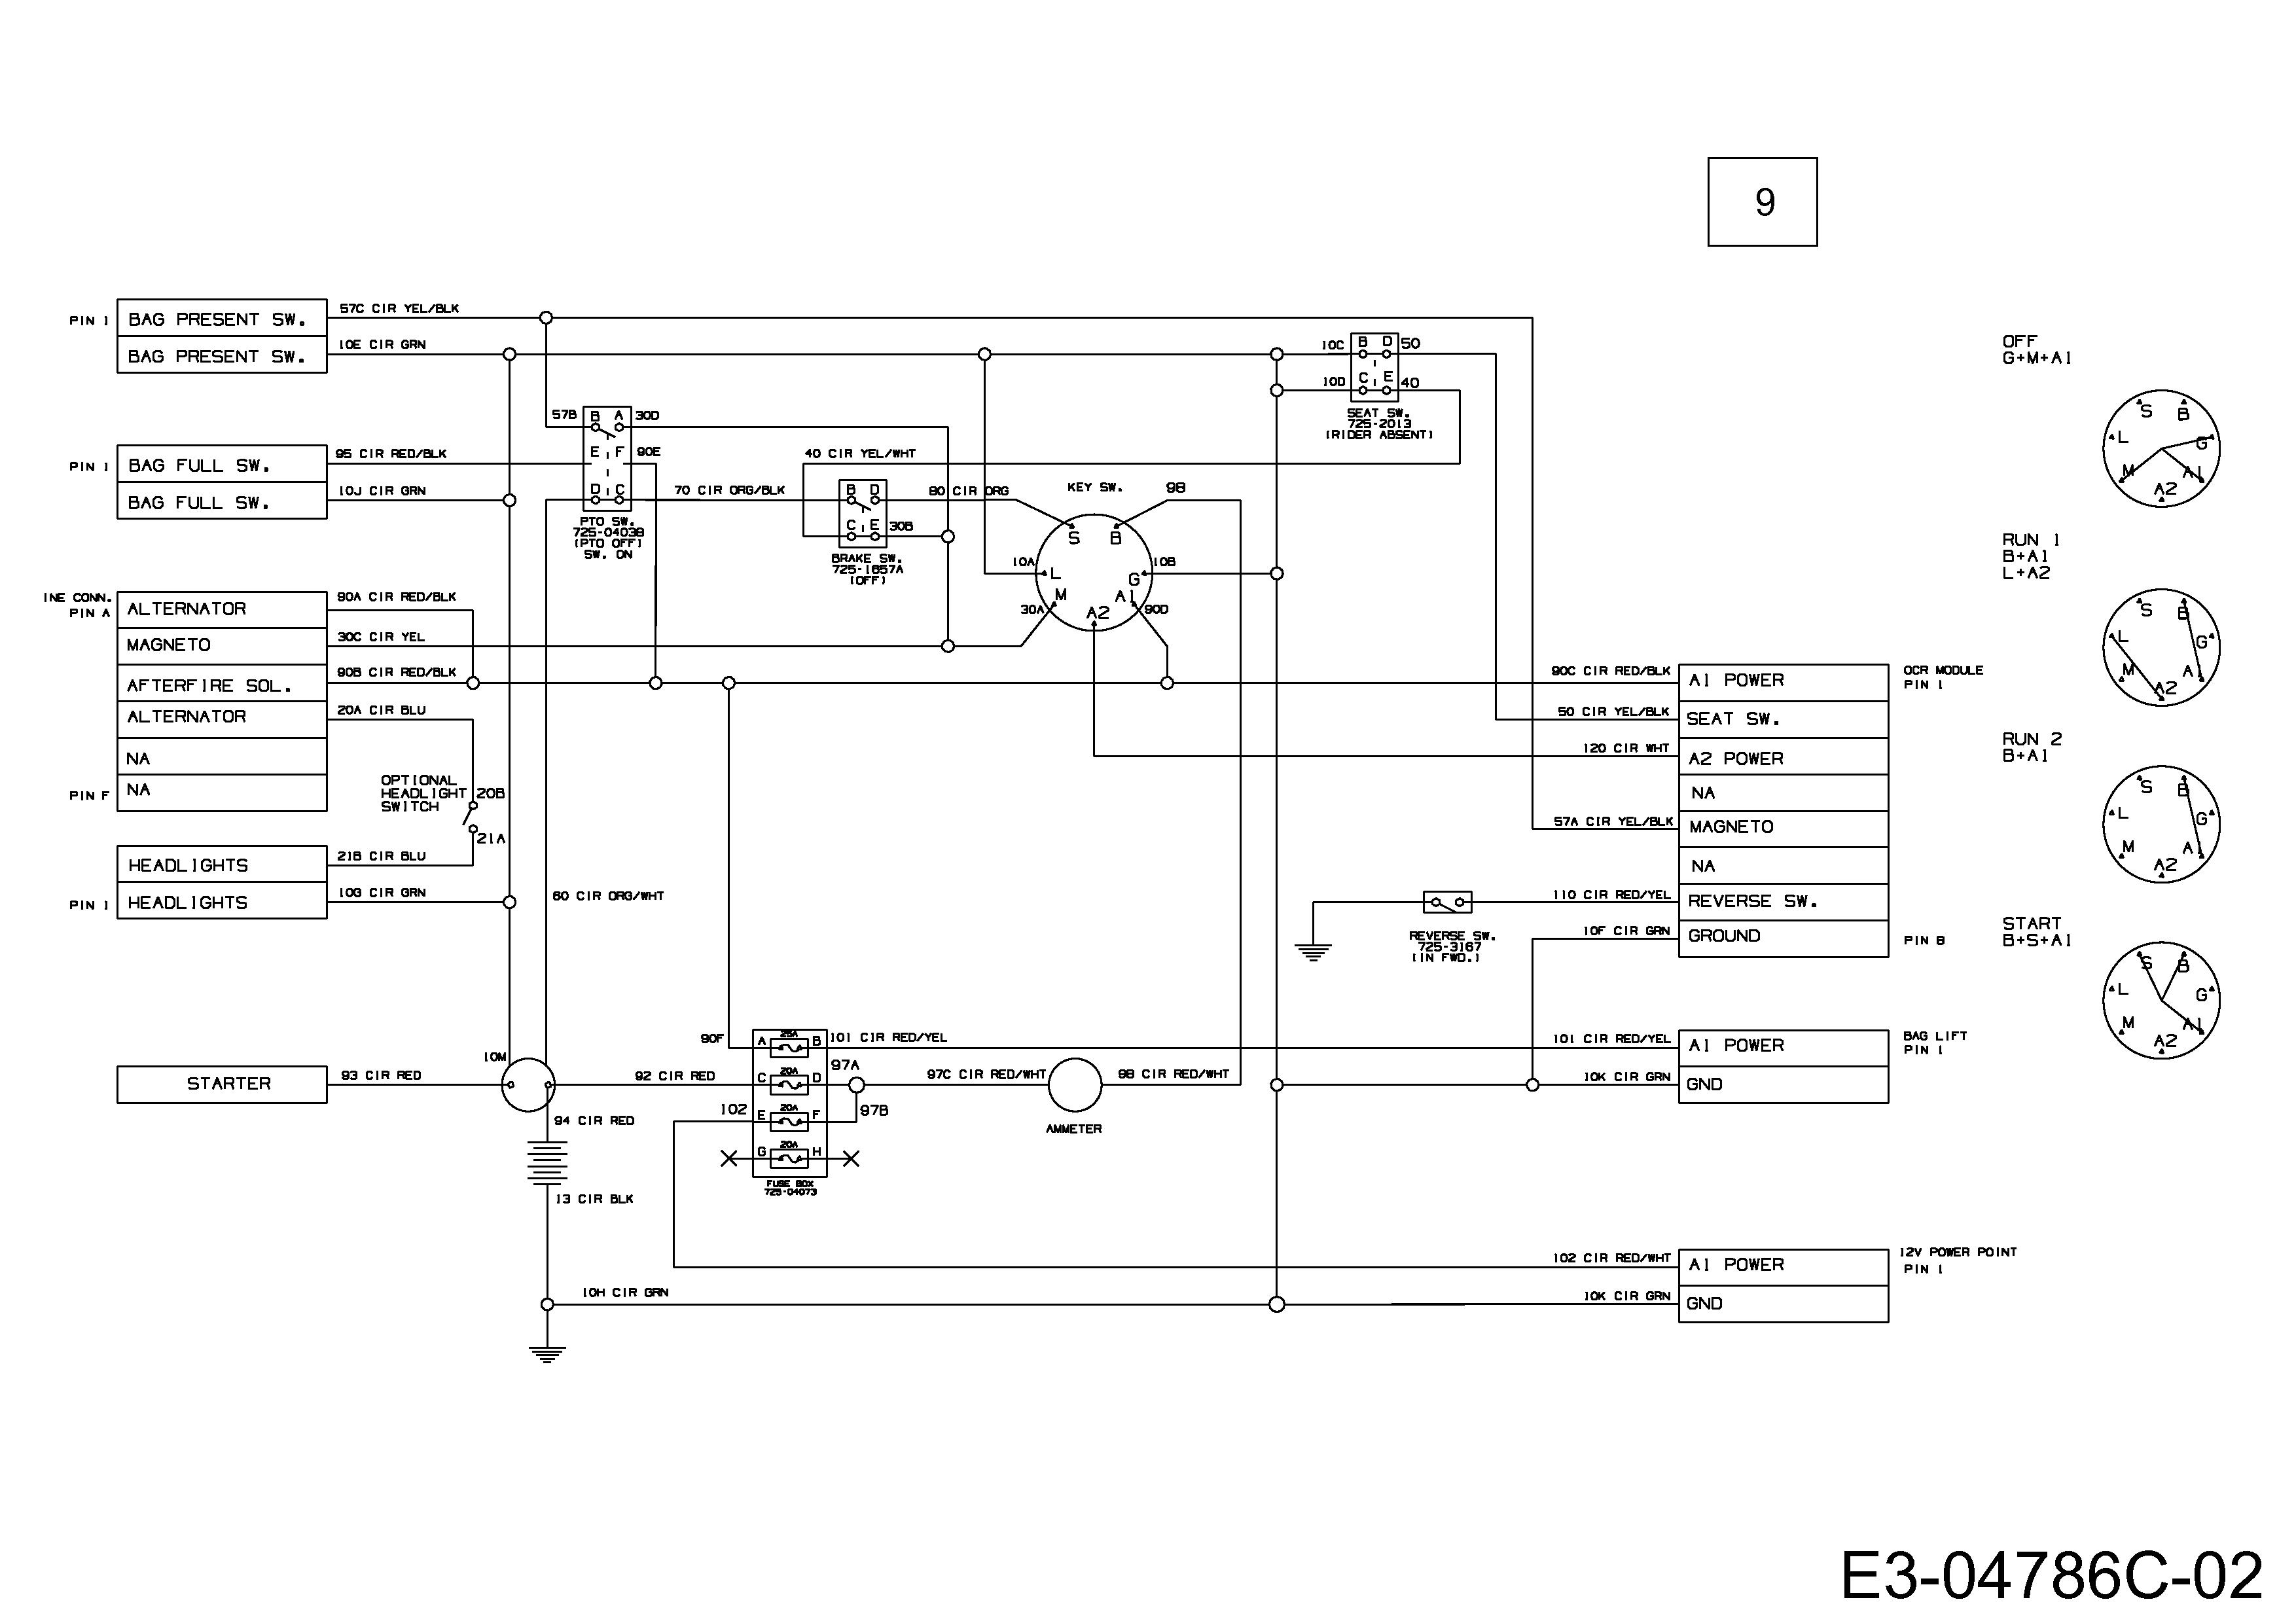 Gutbrod GLX 105 RH Schaltplan 13DJ51GN690 (2012)